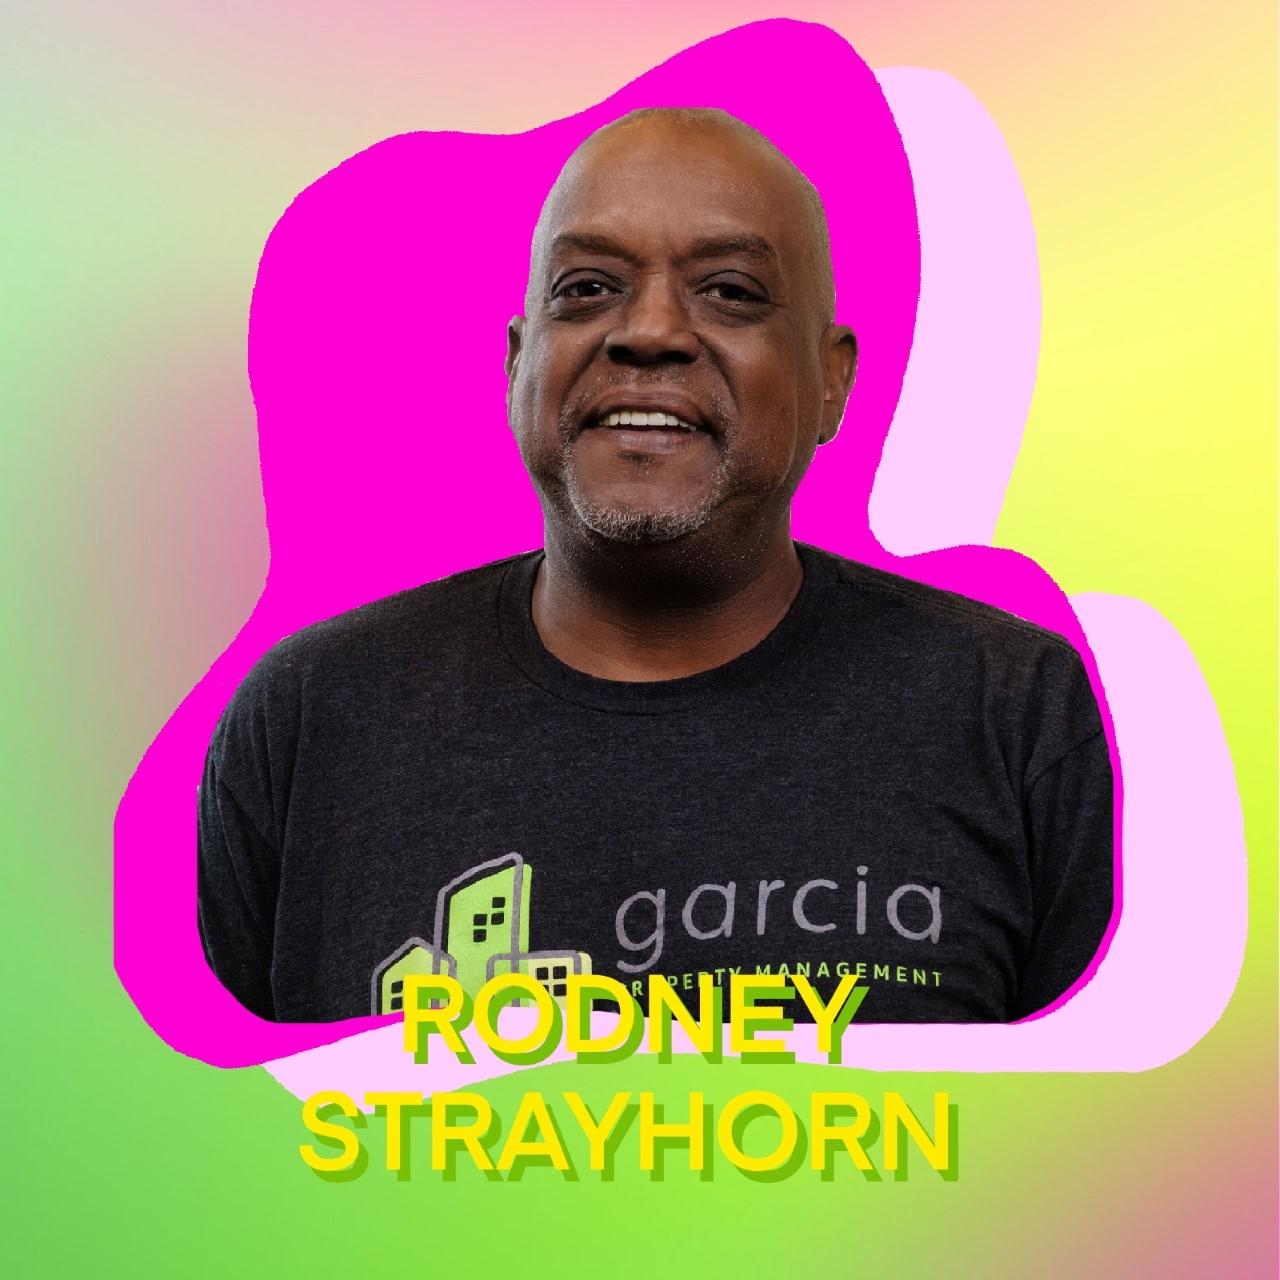 """Rodney Strayhorn"" superimposed over his headshot"